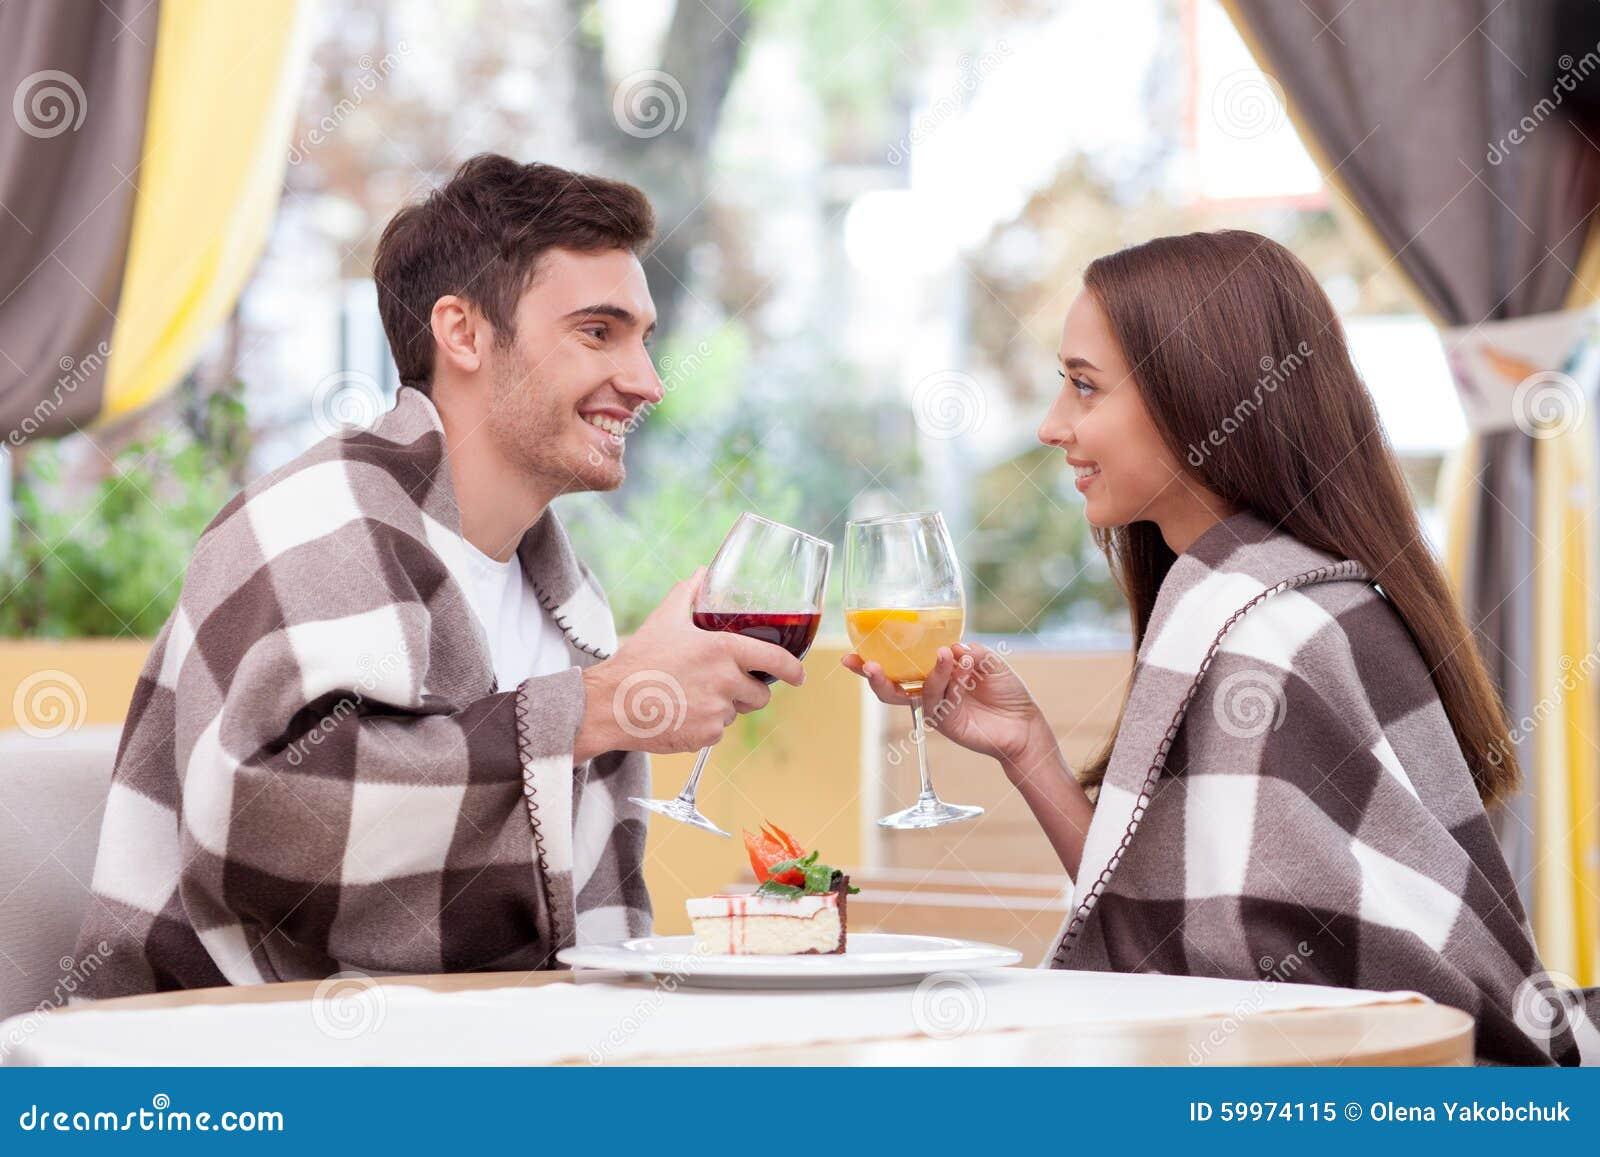 Filipinocupid.com asian dating